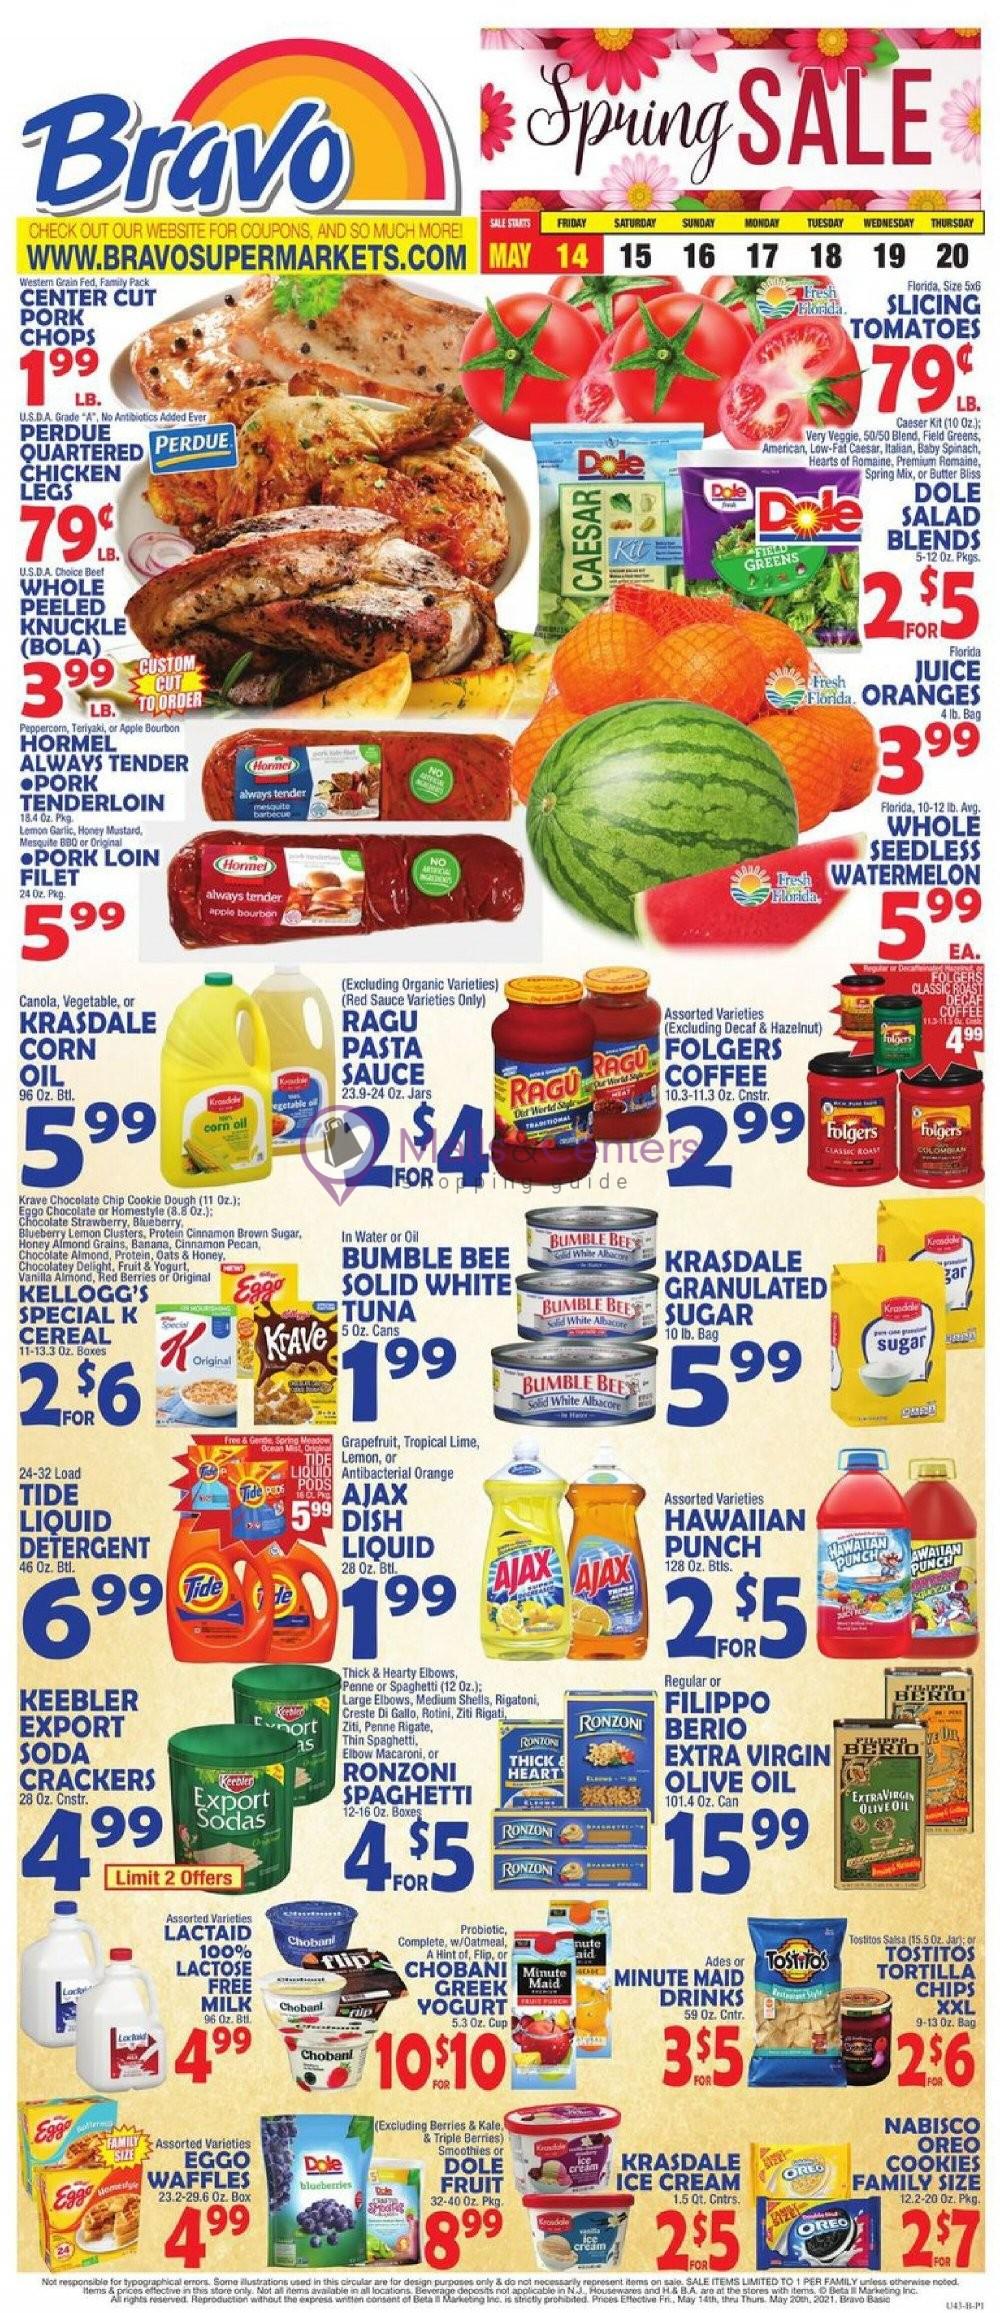 weekly ads Bravo Supermarkets - page 1 - mallscenters.com